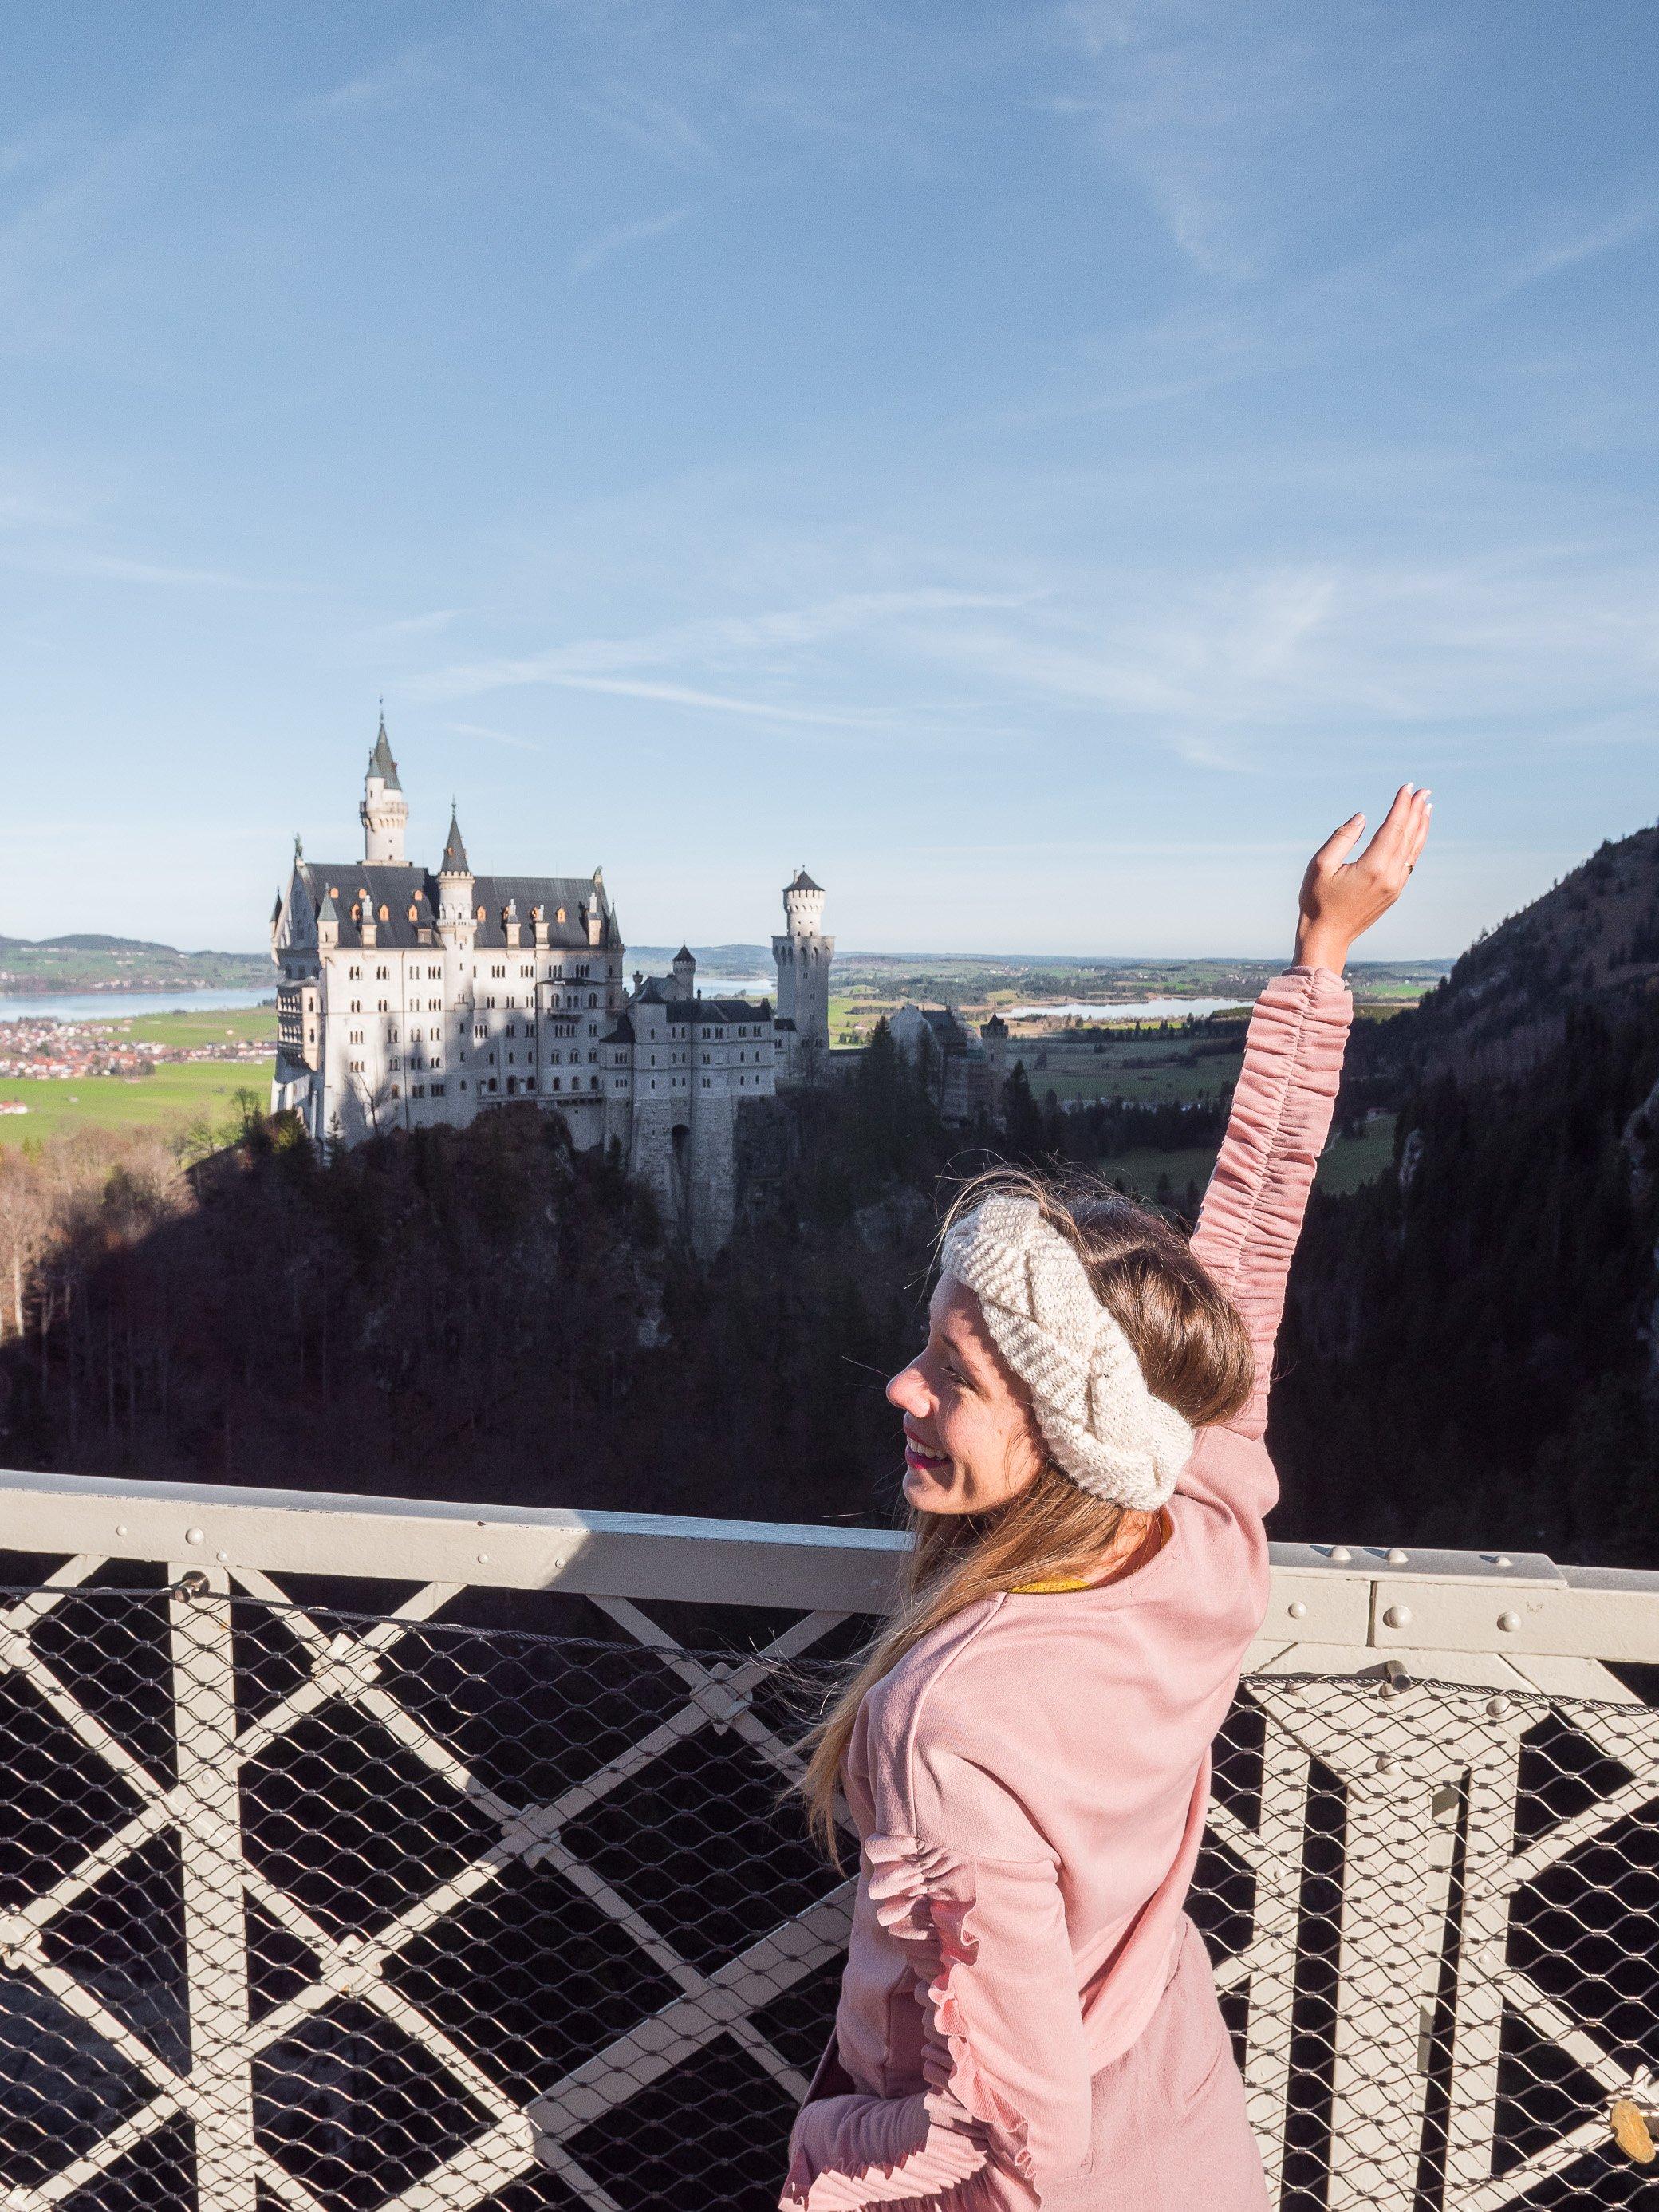 visiter le château de Neuschwanstein